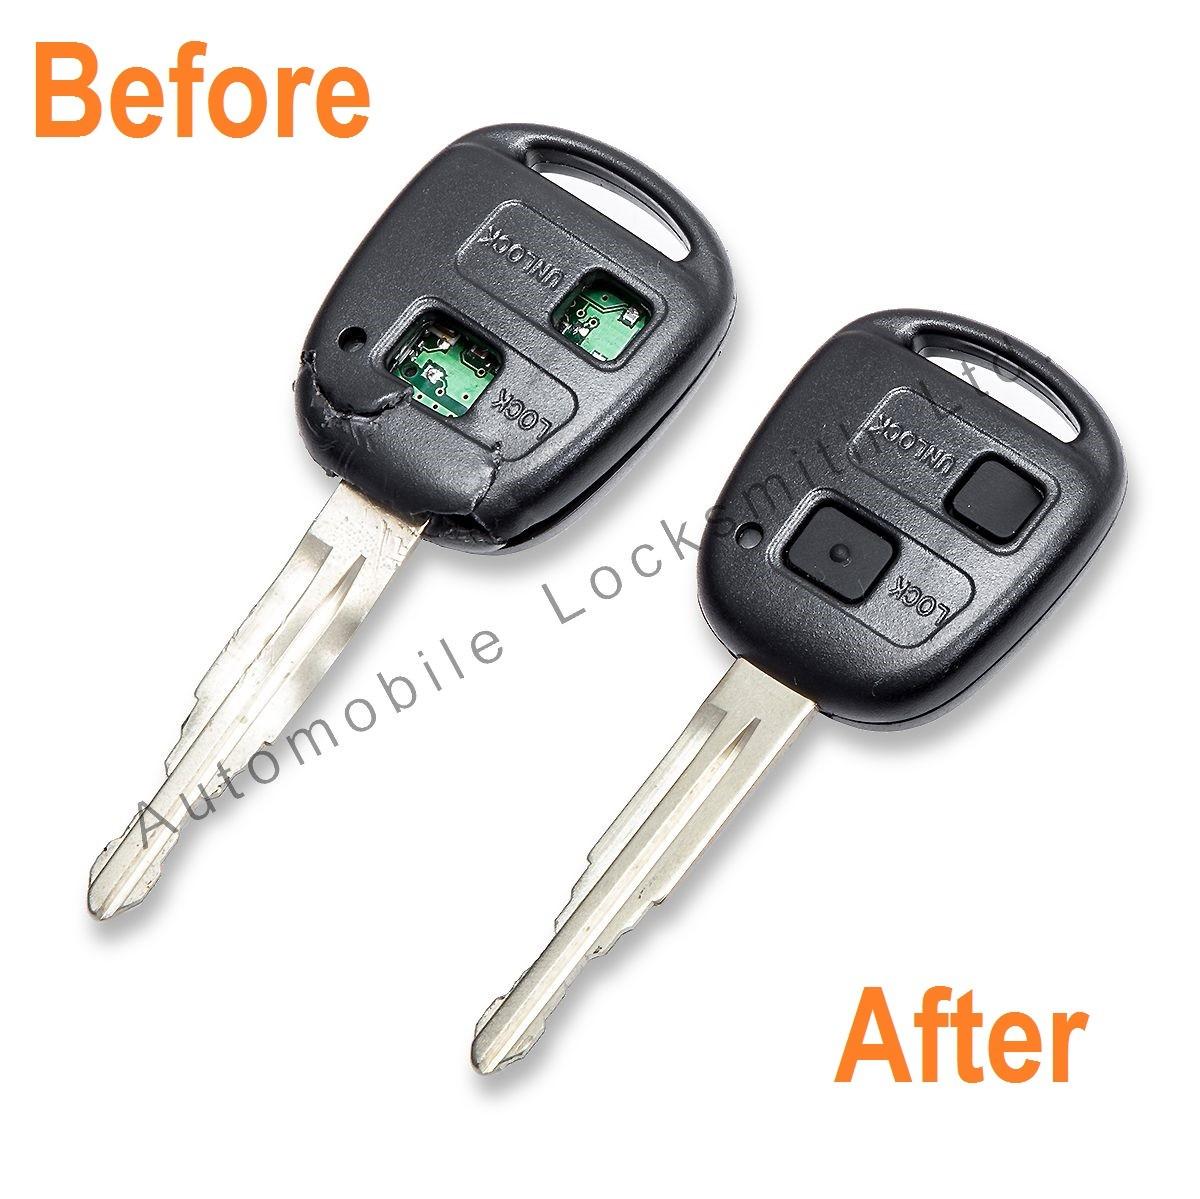 Repair Service for Toyota Lexus 2 3 button remote key